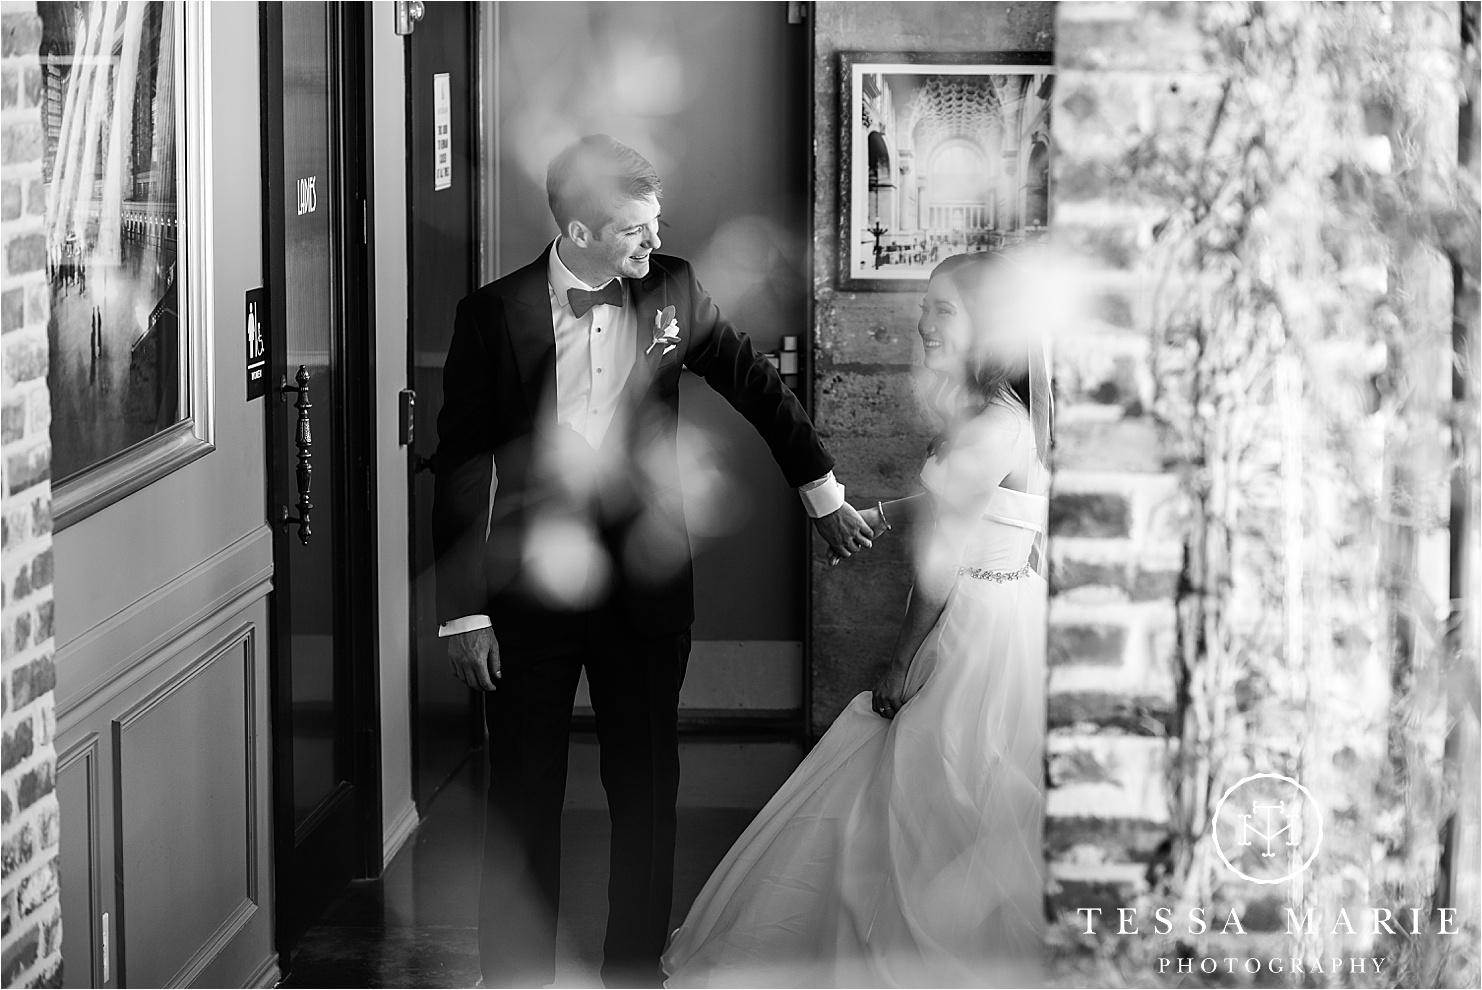 Tessa_marie_weddings_houston_wedding_photographer_The_astorian_0061.jpg